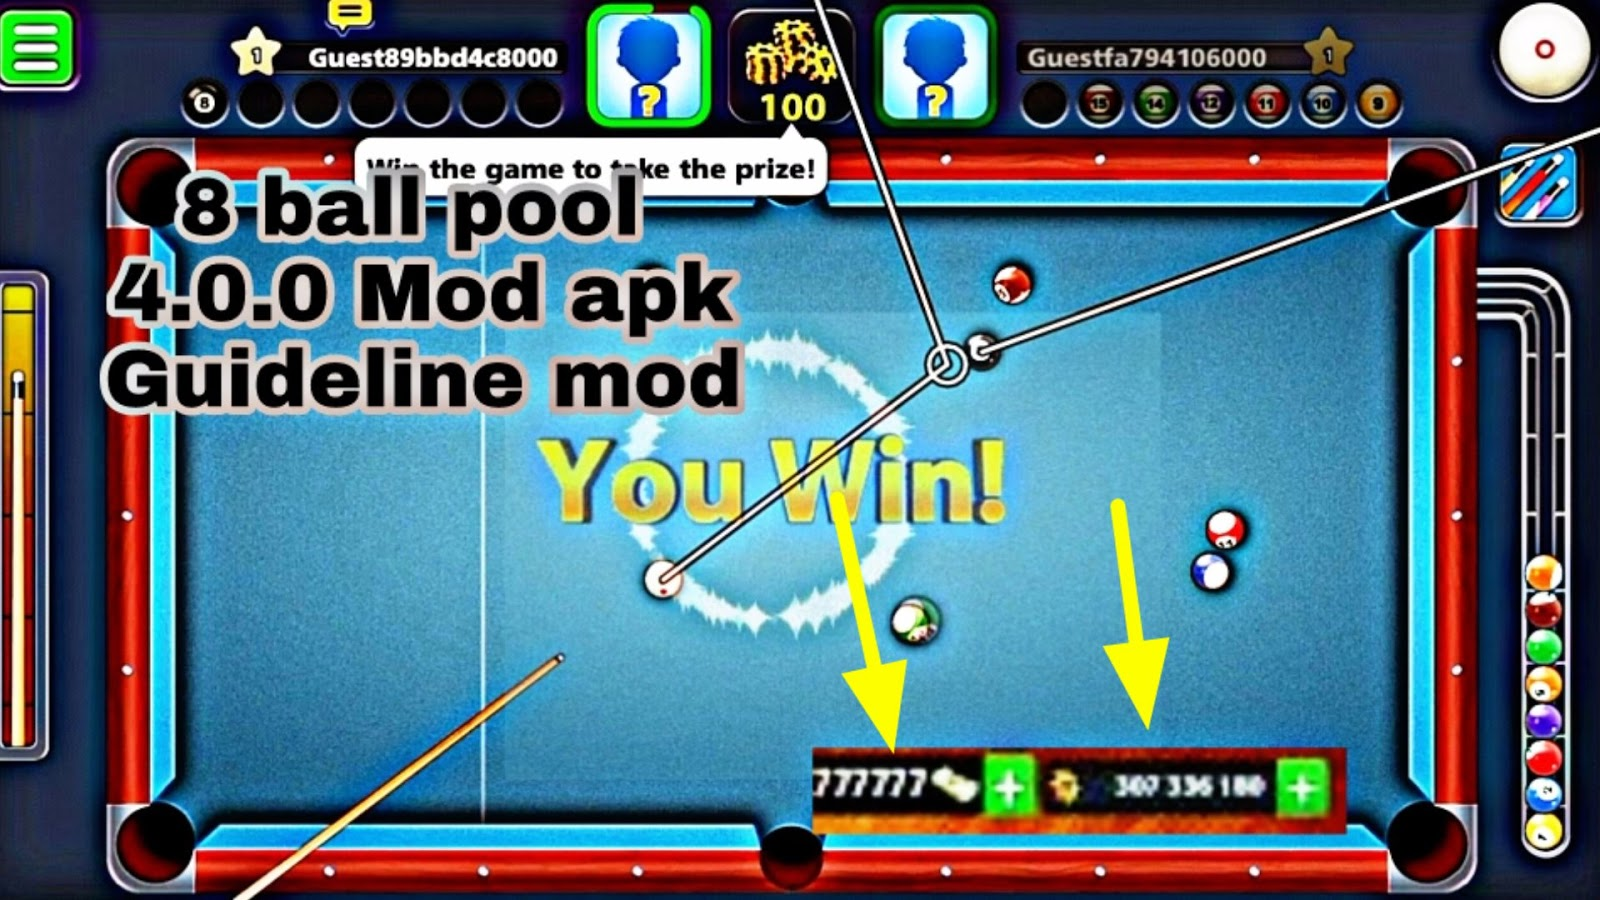 8 ball pool mega mod apk 4.0.0